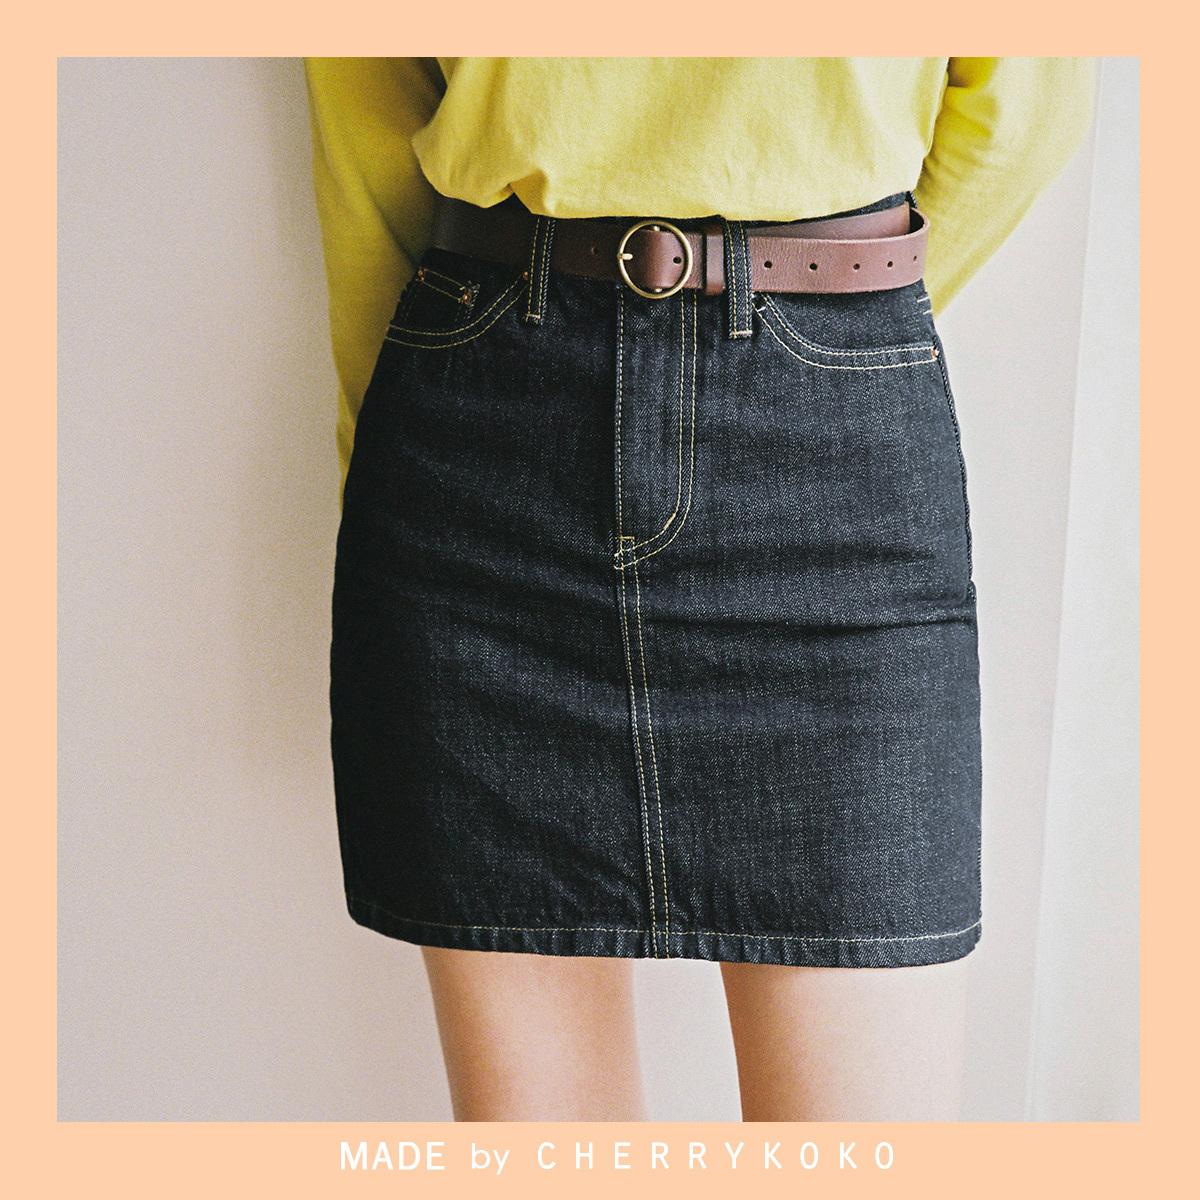 [CHERRYKOKO官方旗艦店]基本款單寧牛仔短裙